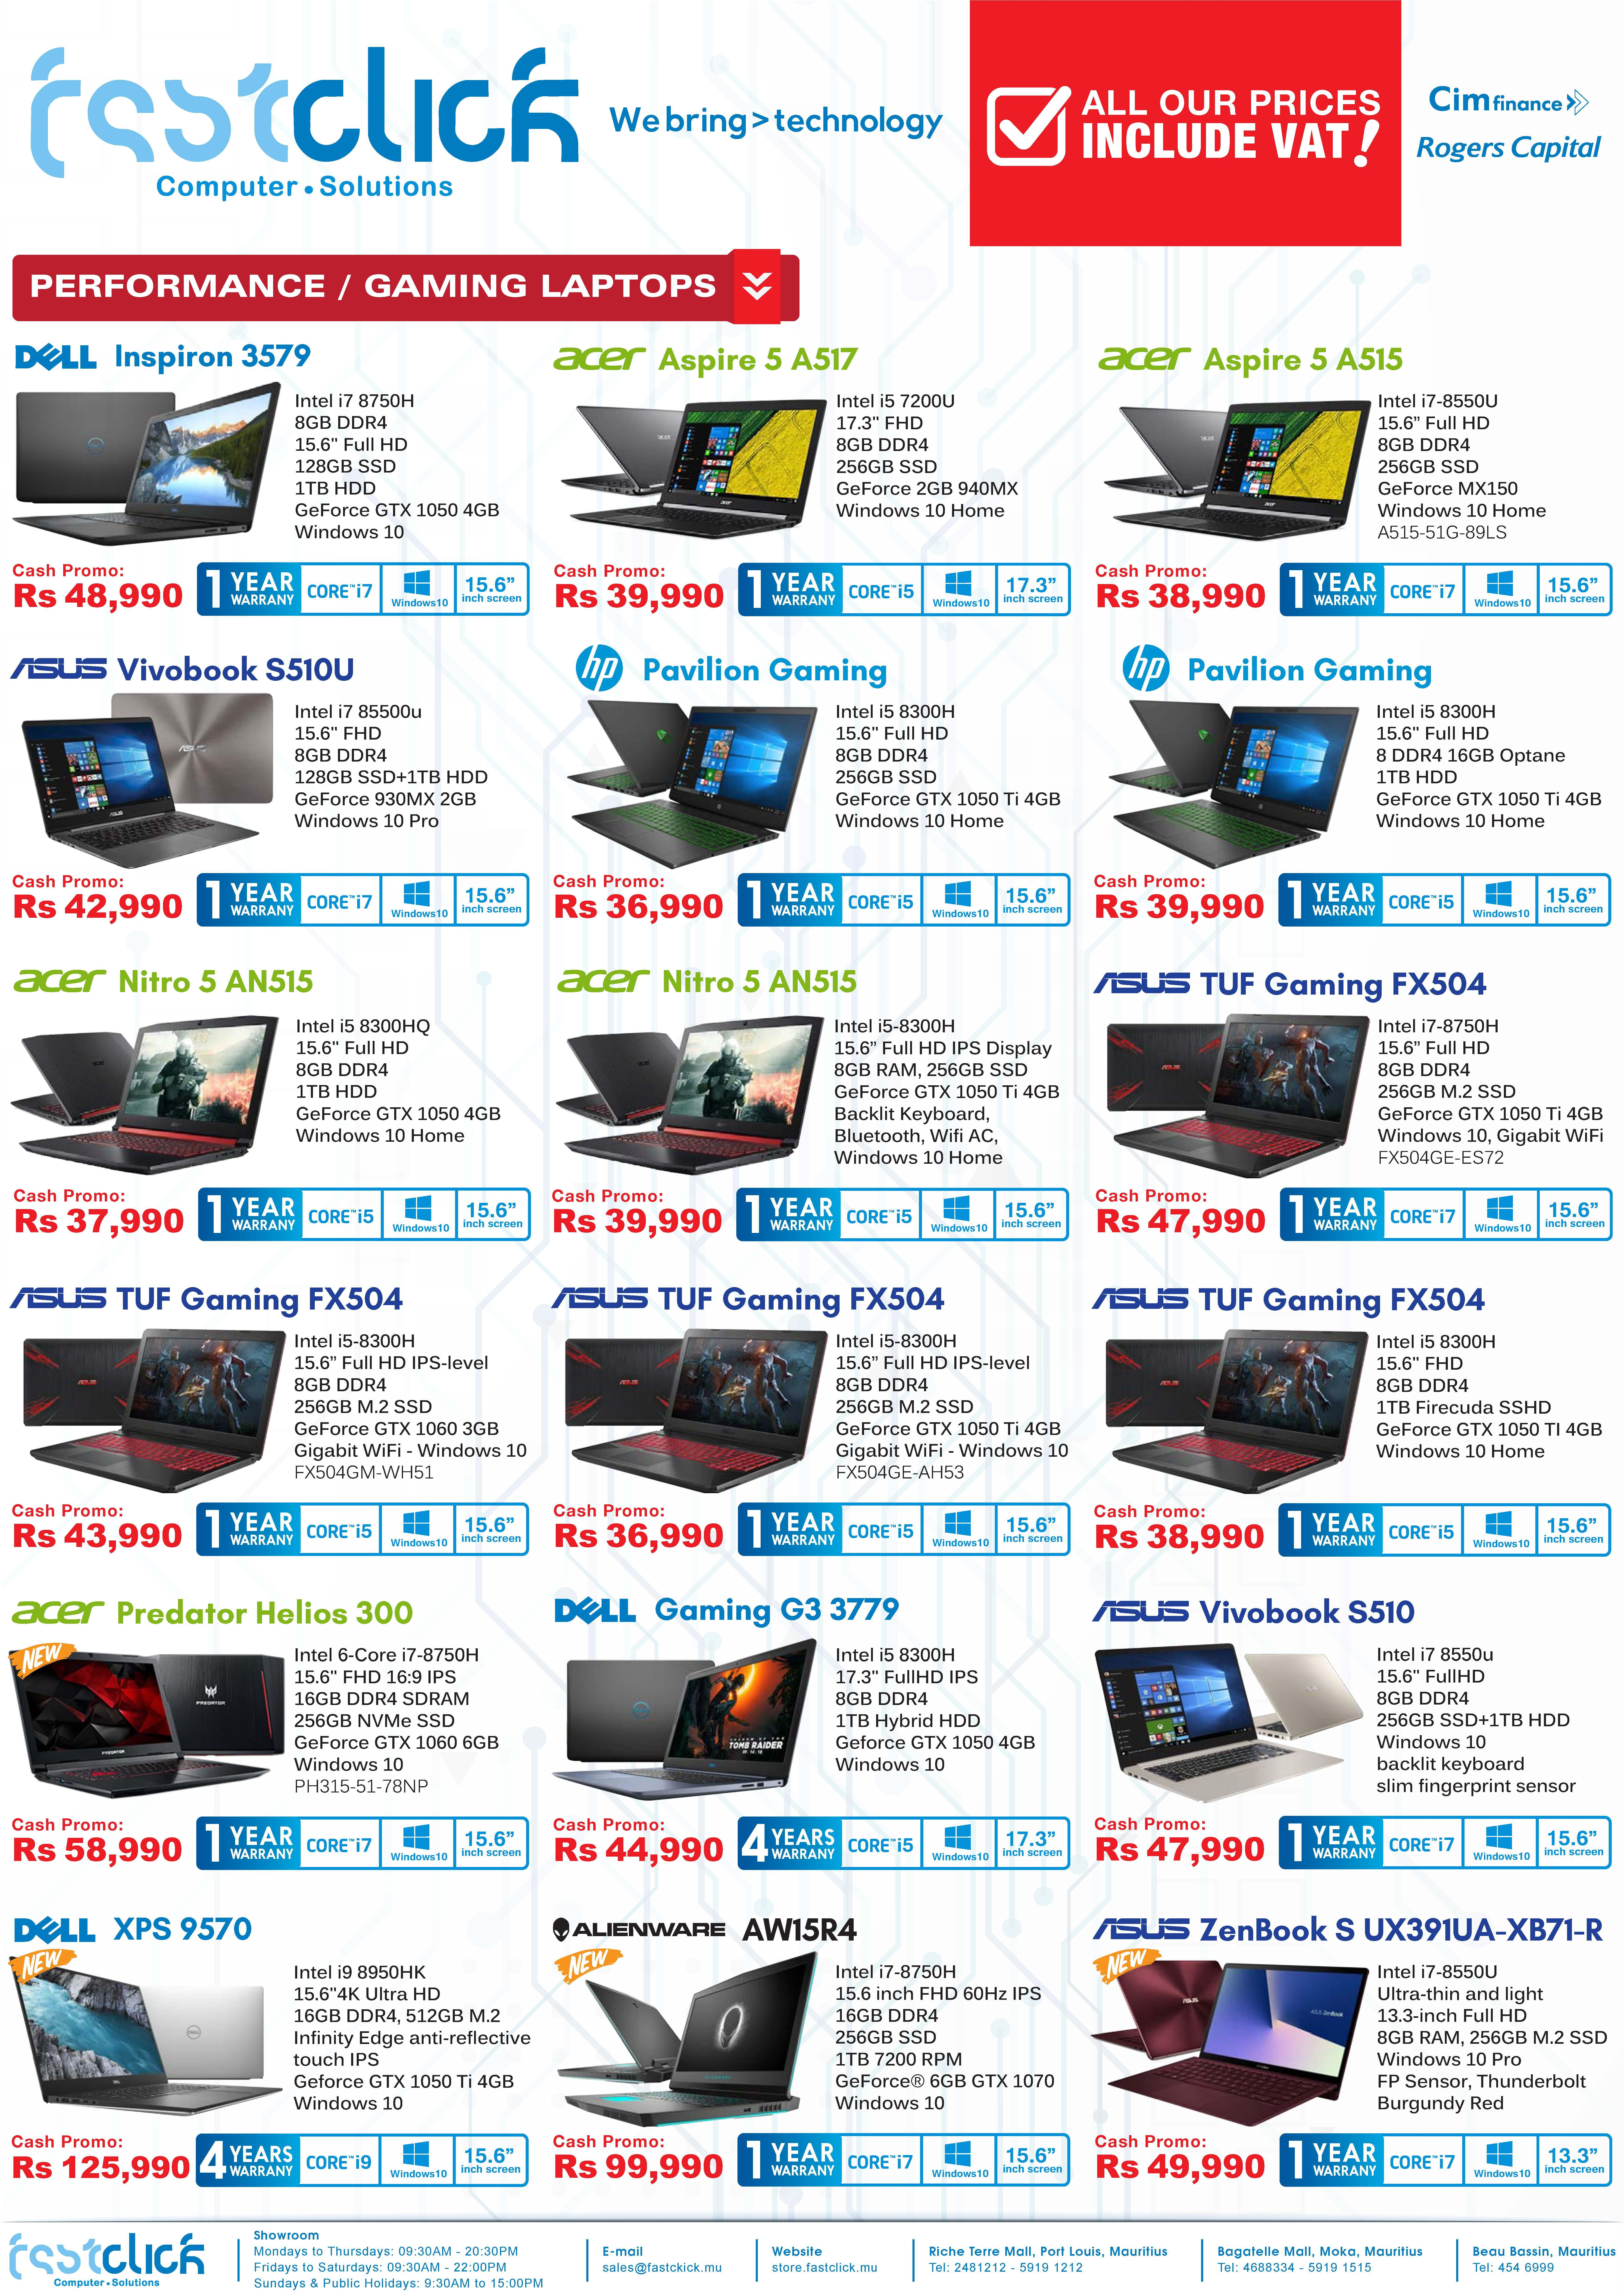 page-4-gaming-laptop-price-list-16.04.16.jpg